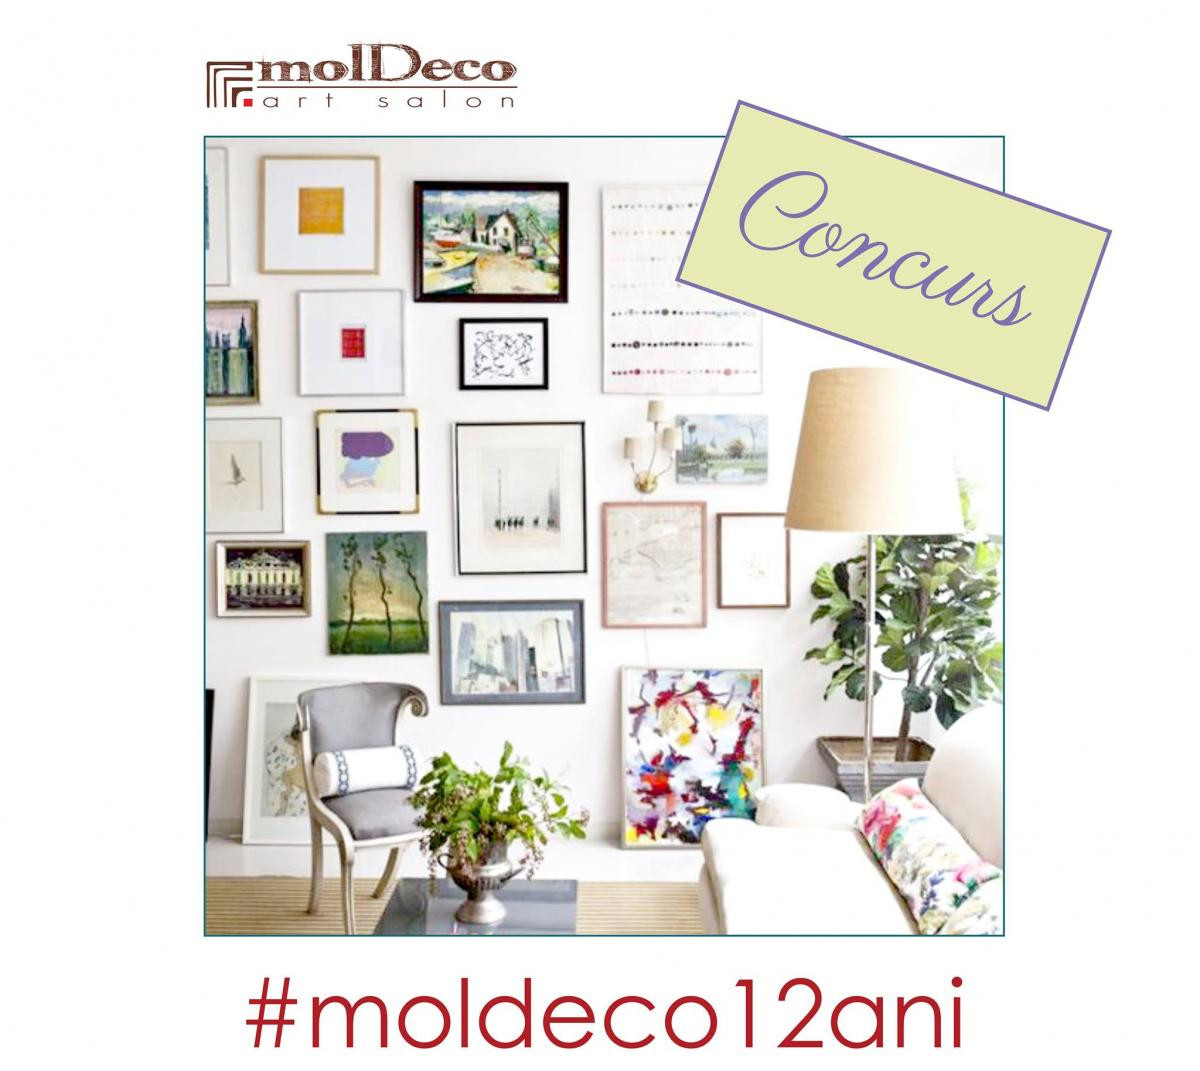 CONCURS! #MOLDECO12ANI